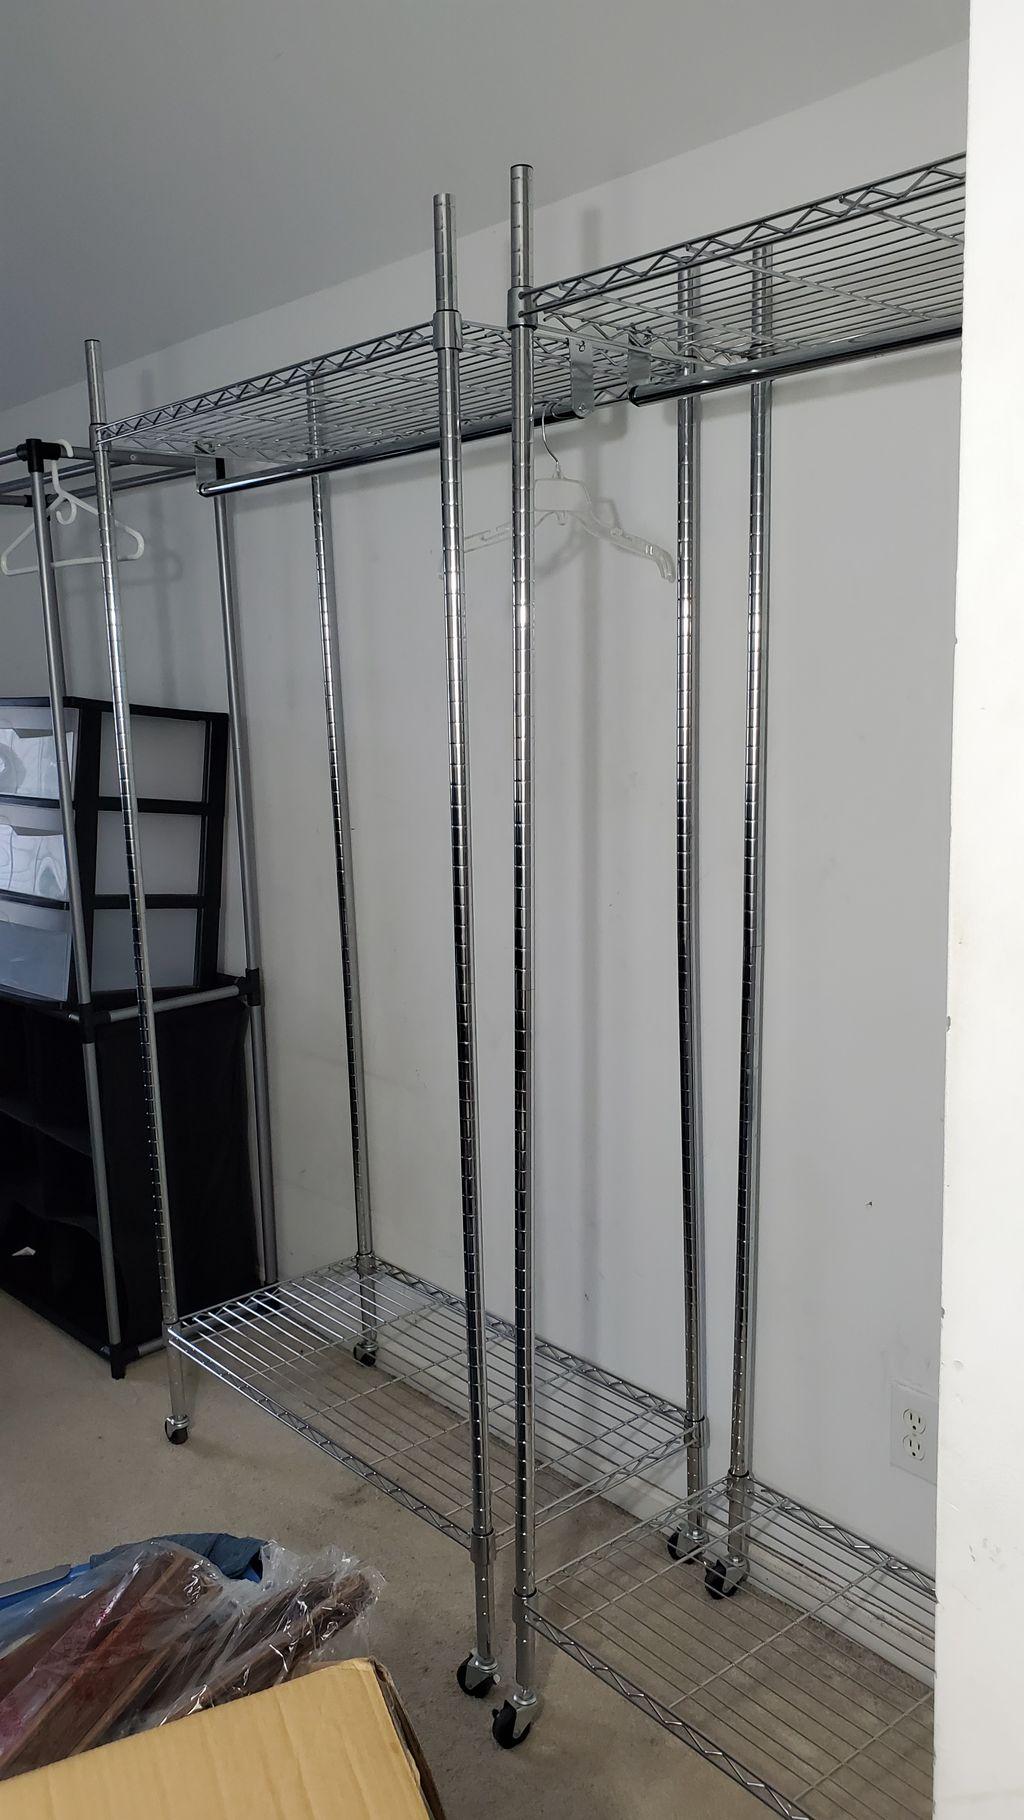 Small bedroom turned closet transformation